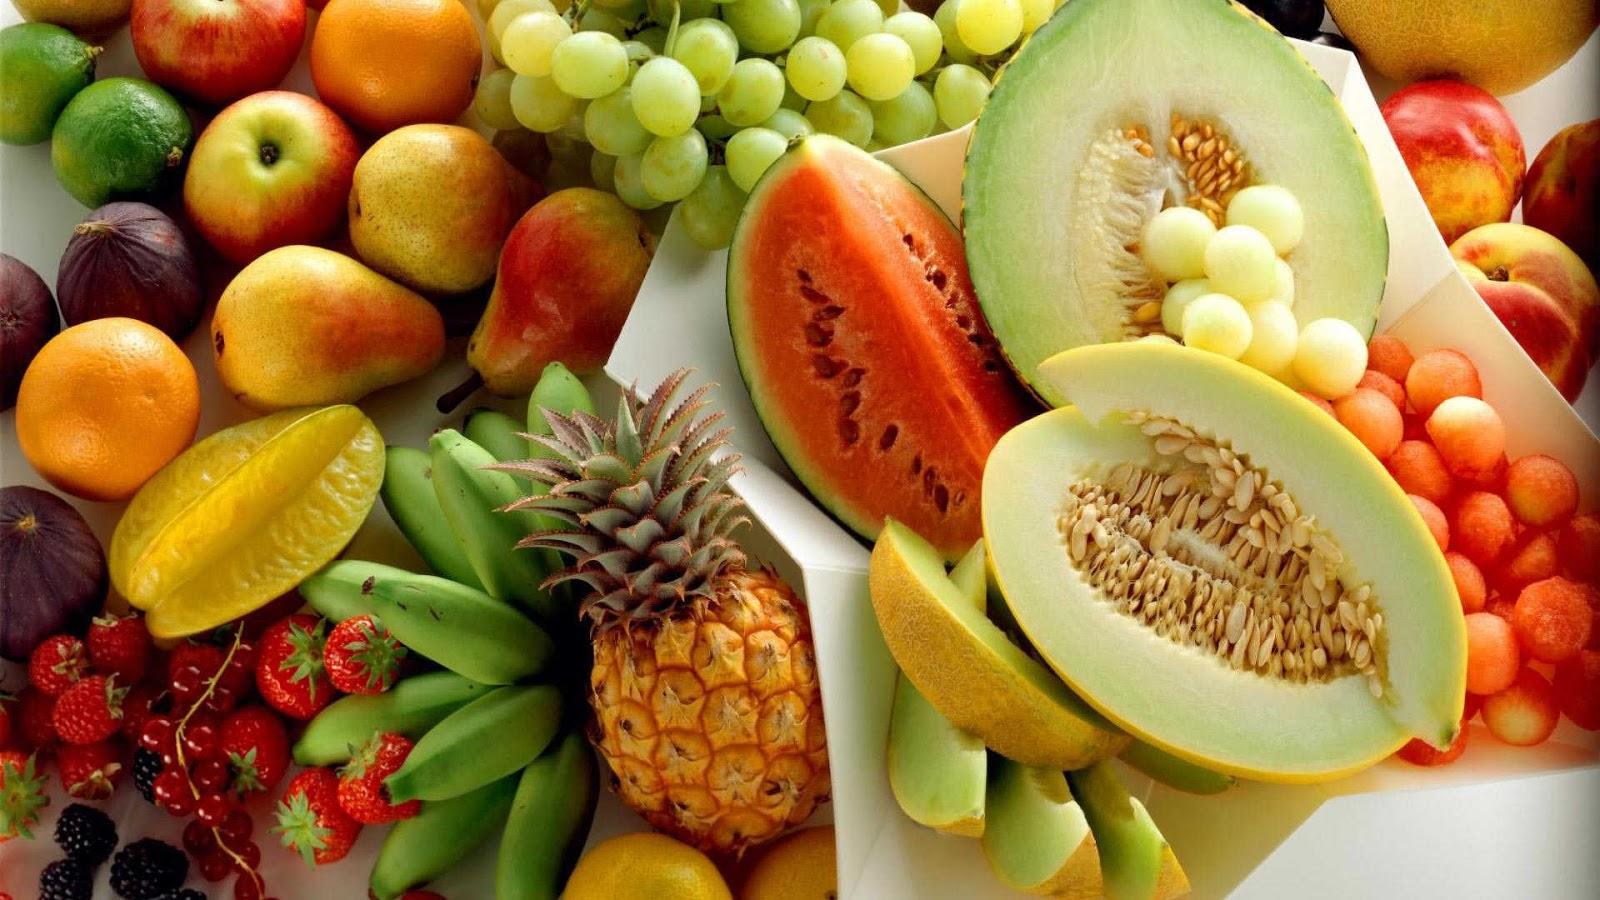 Wallpaper Kumpulan Buah Segar Gratis Fruit Salad Most Expensive 1600x900 Download Hd Wallpaper Wallpapertip